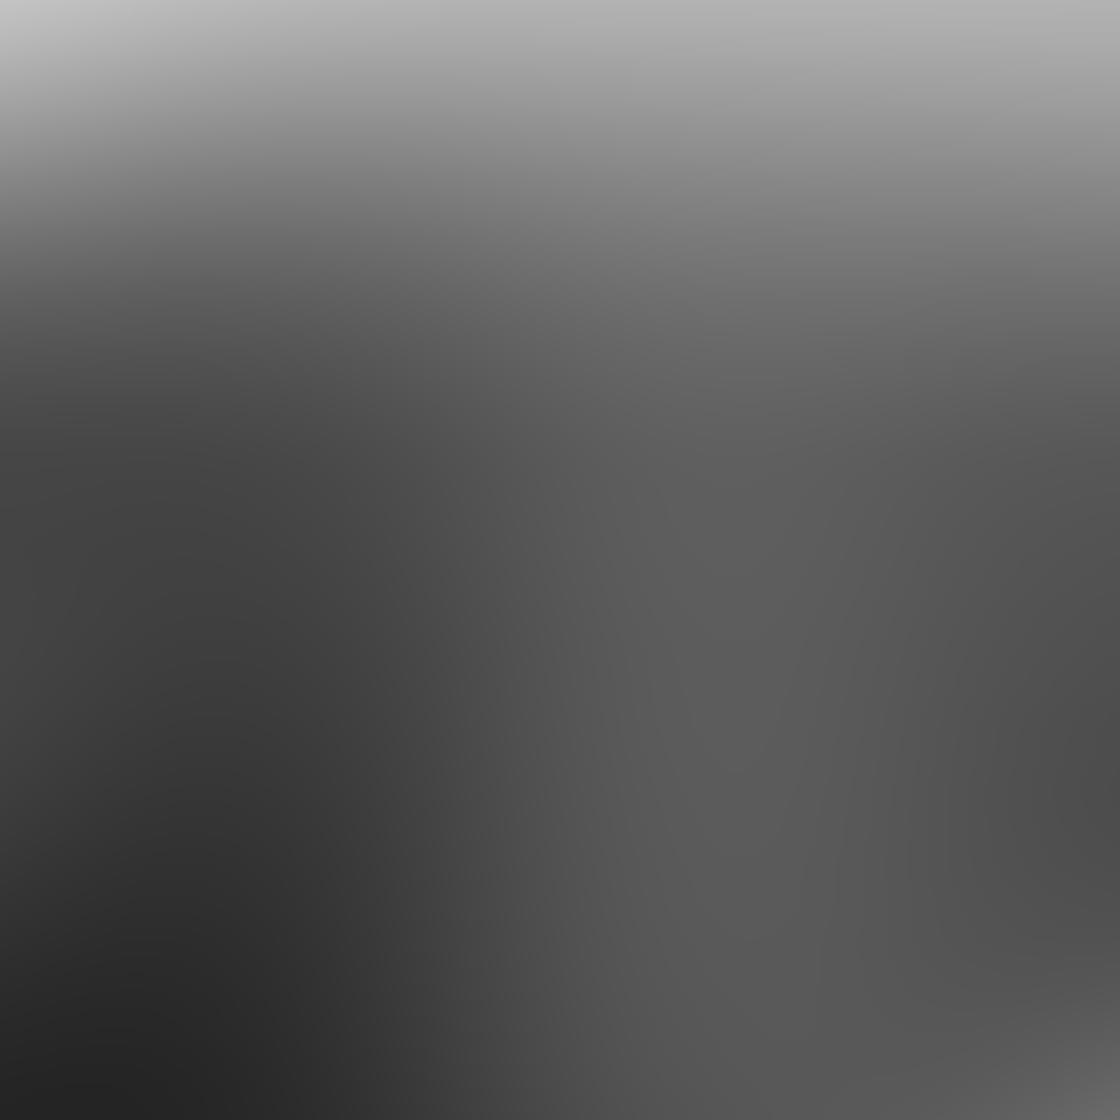 iPhone Photos Composition Small Screen 22